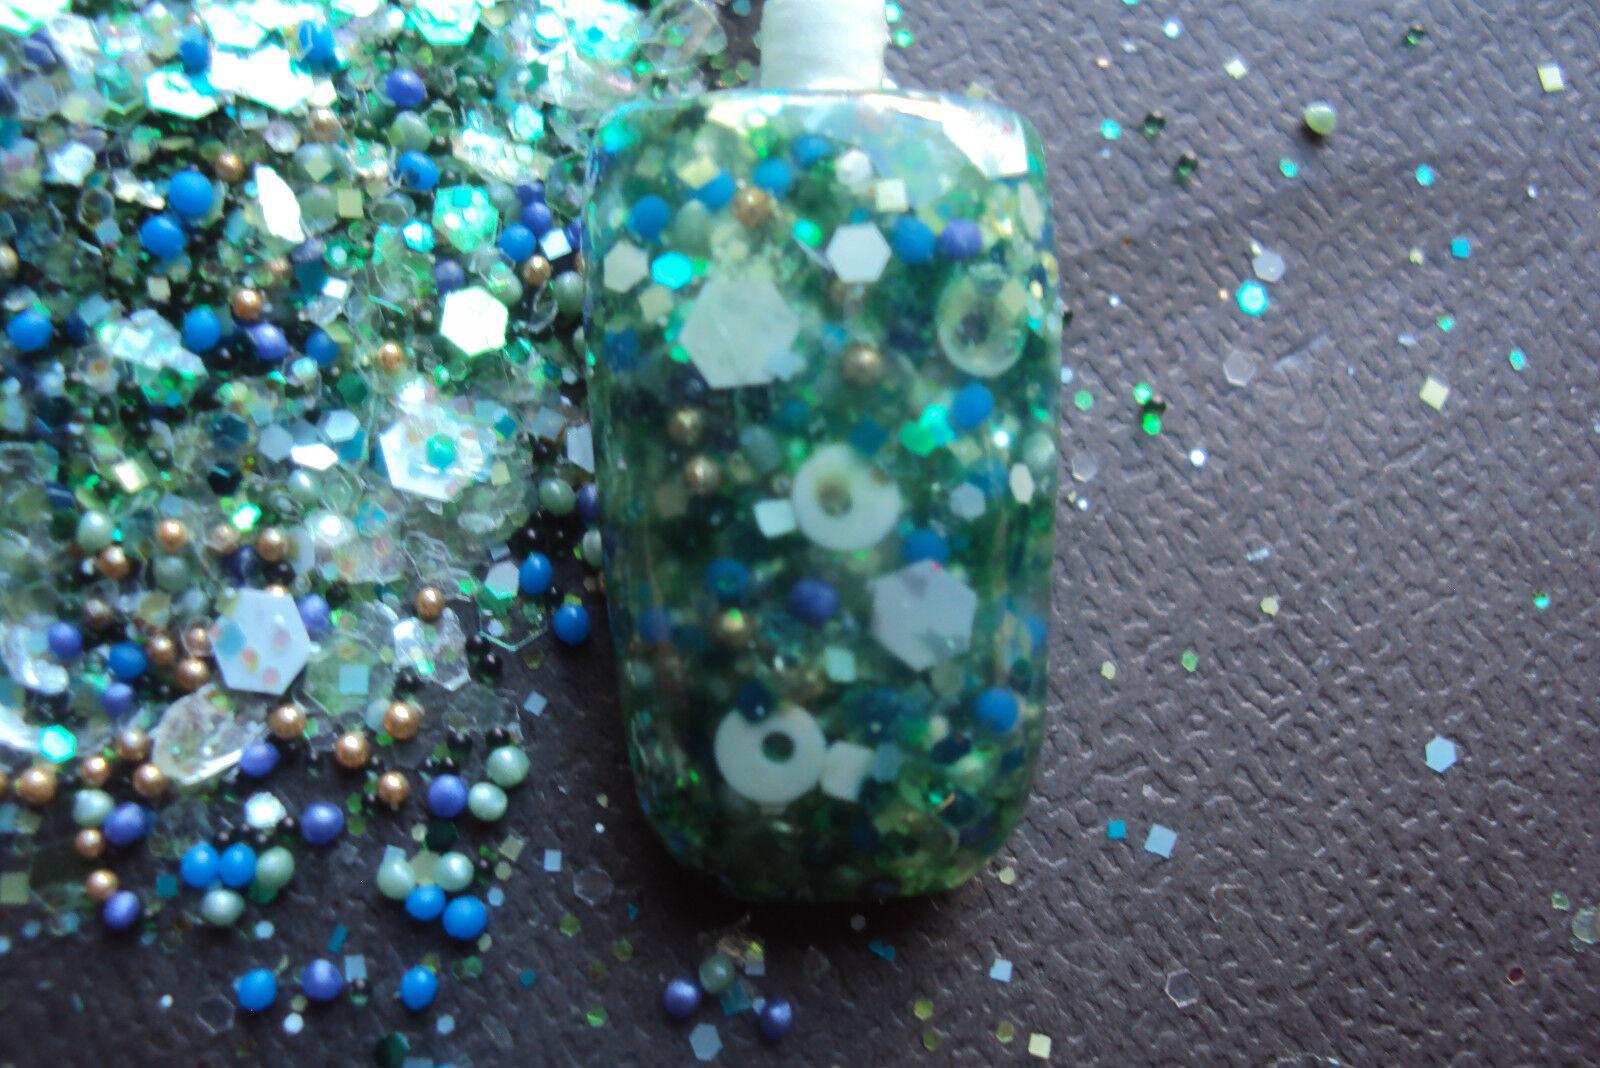 Glitter Mix Nail Art Acrylic GEL Fantasia Limited Edition 13 Made | eBay